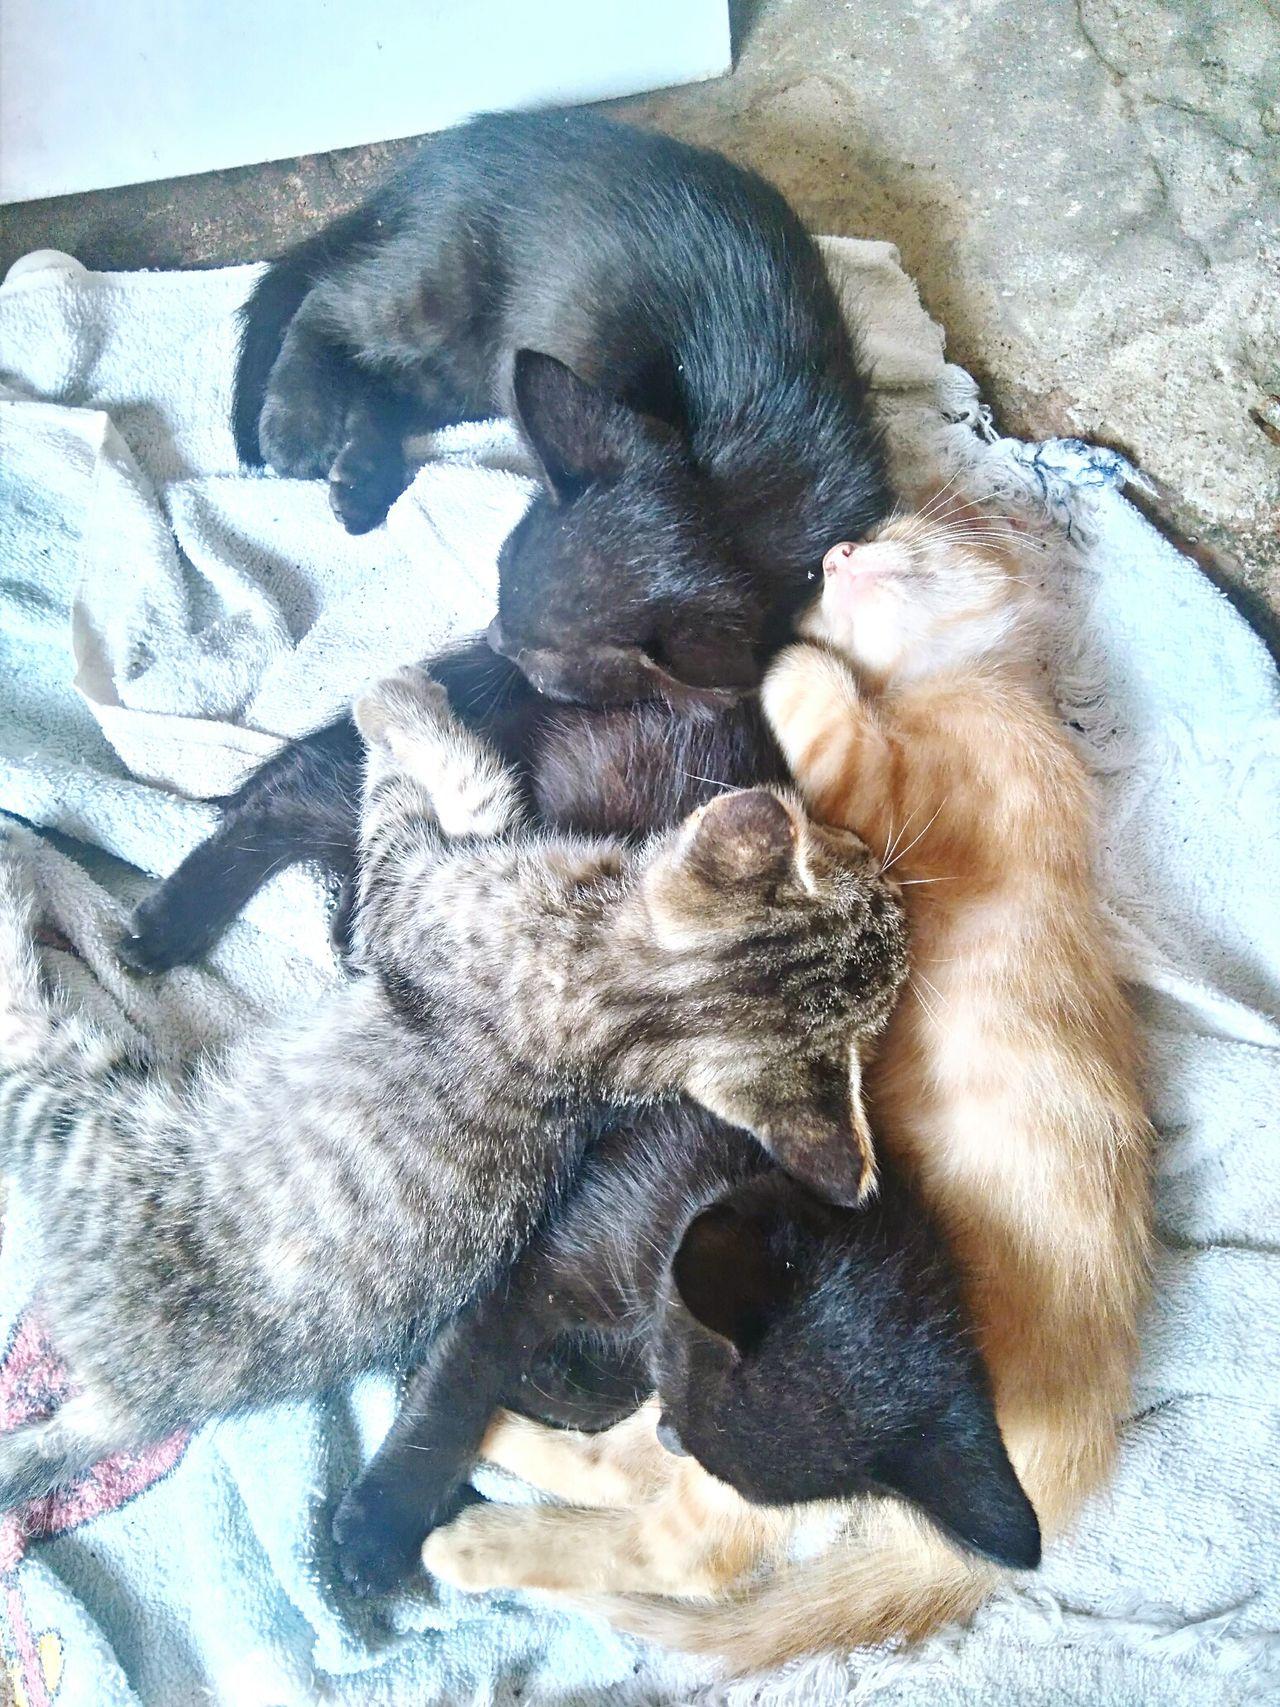 Pets Domestic Animals Bed Day Relaxation Happy Beautiful ♥ Cats Of EyeEm Bestmoment BLackCat Puppy Sleep Sleepy Puppy Baby Cat Animal Babycat